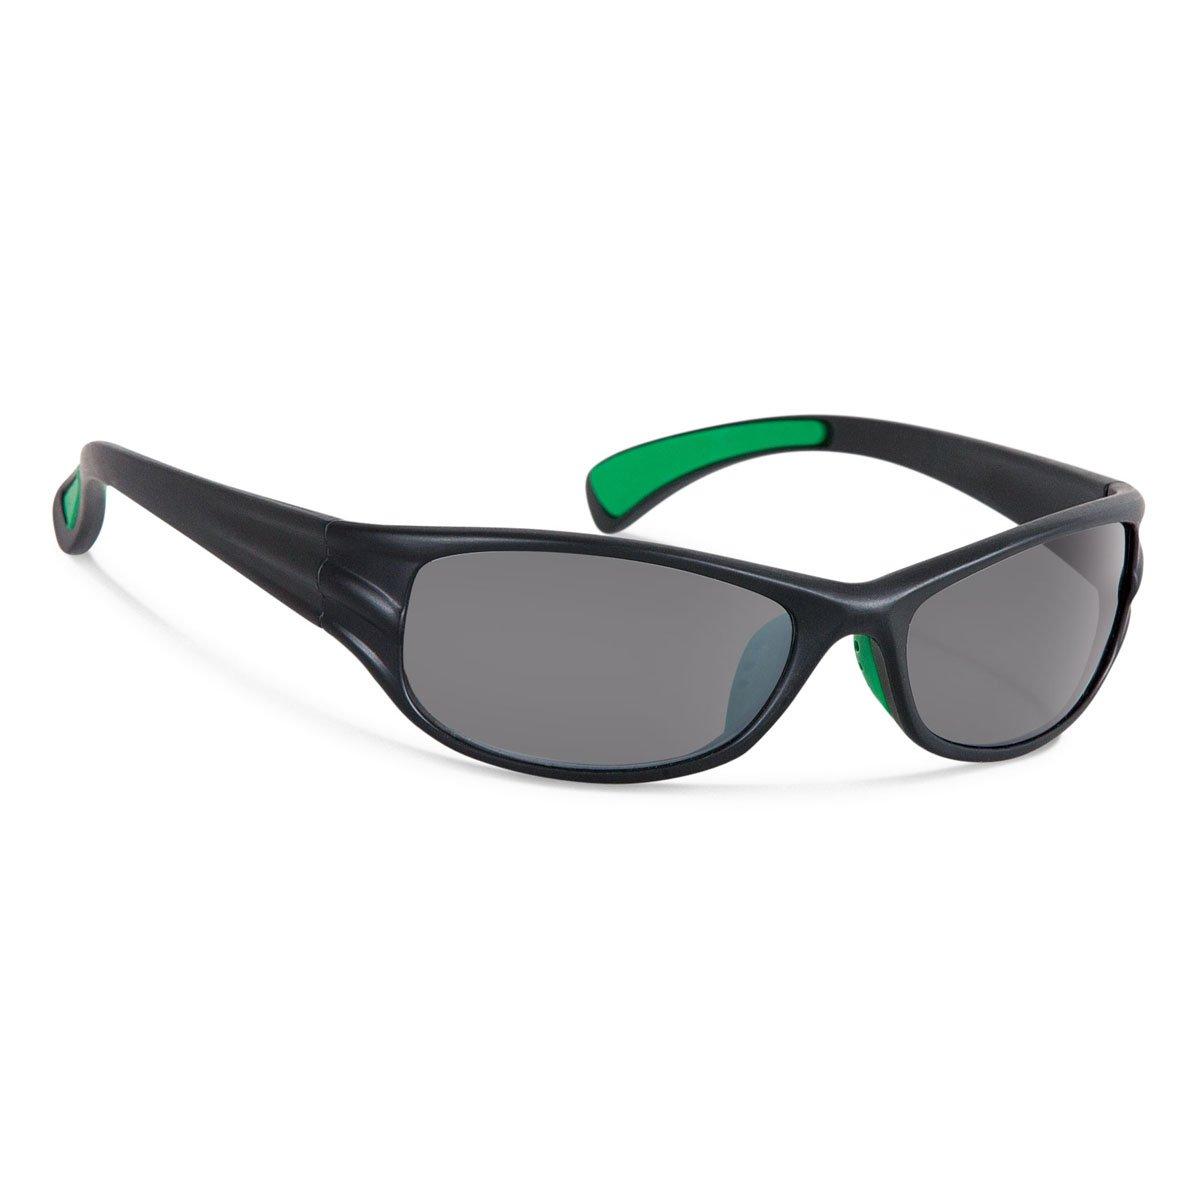 Forecast Optics Tumble Sunglasses Smith Optics